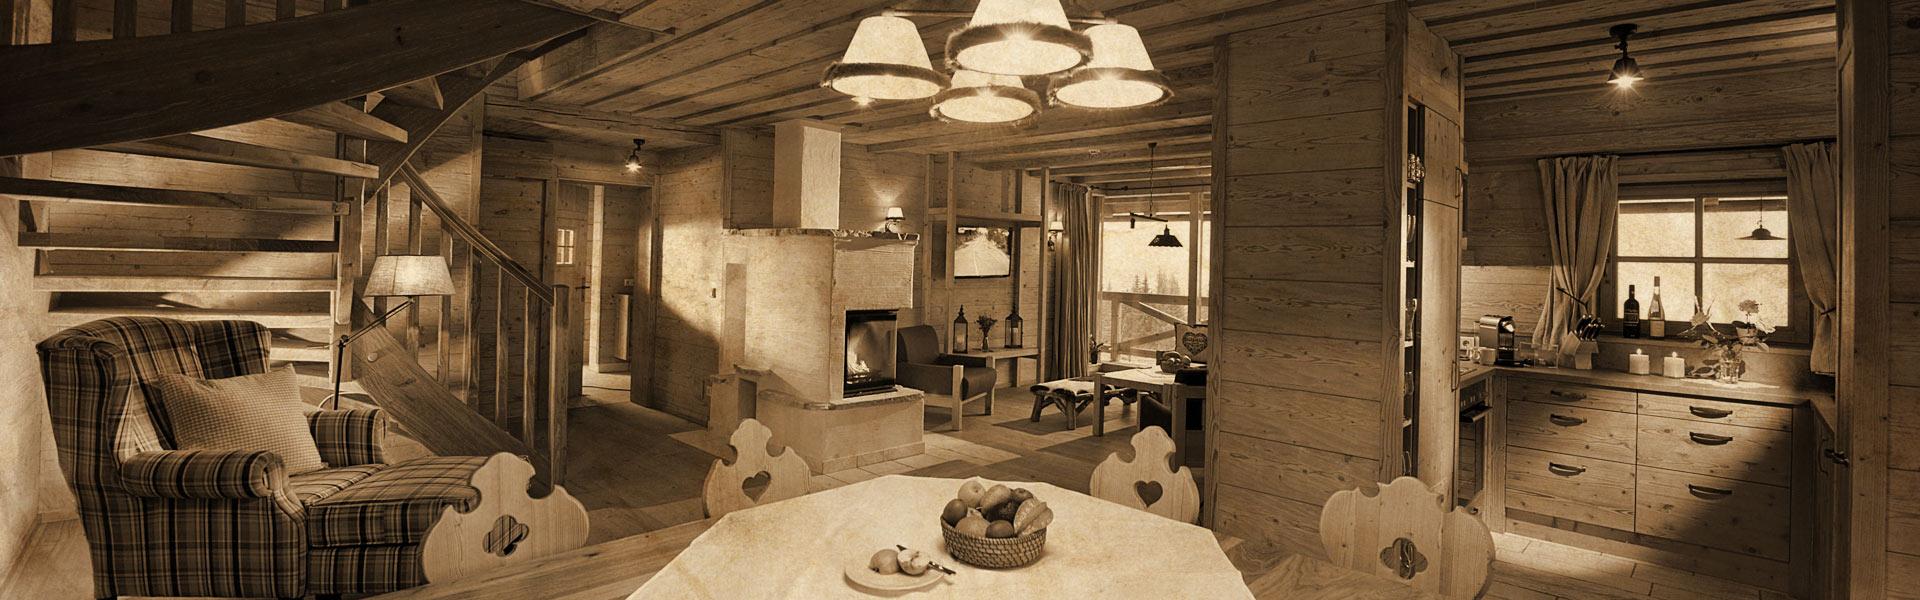 romantische-lodges